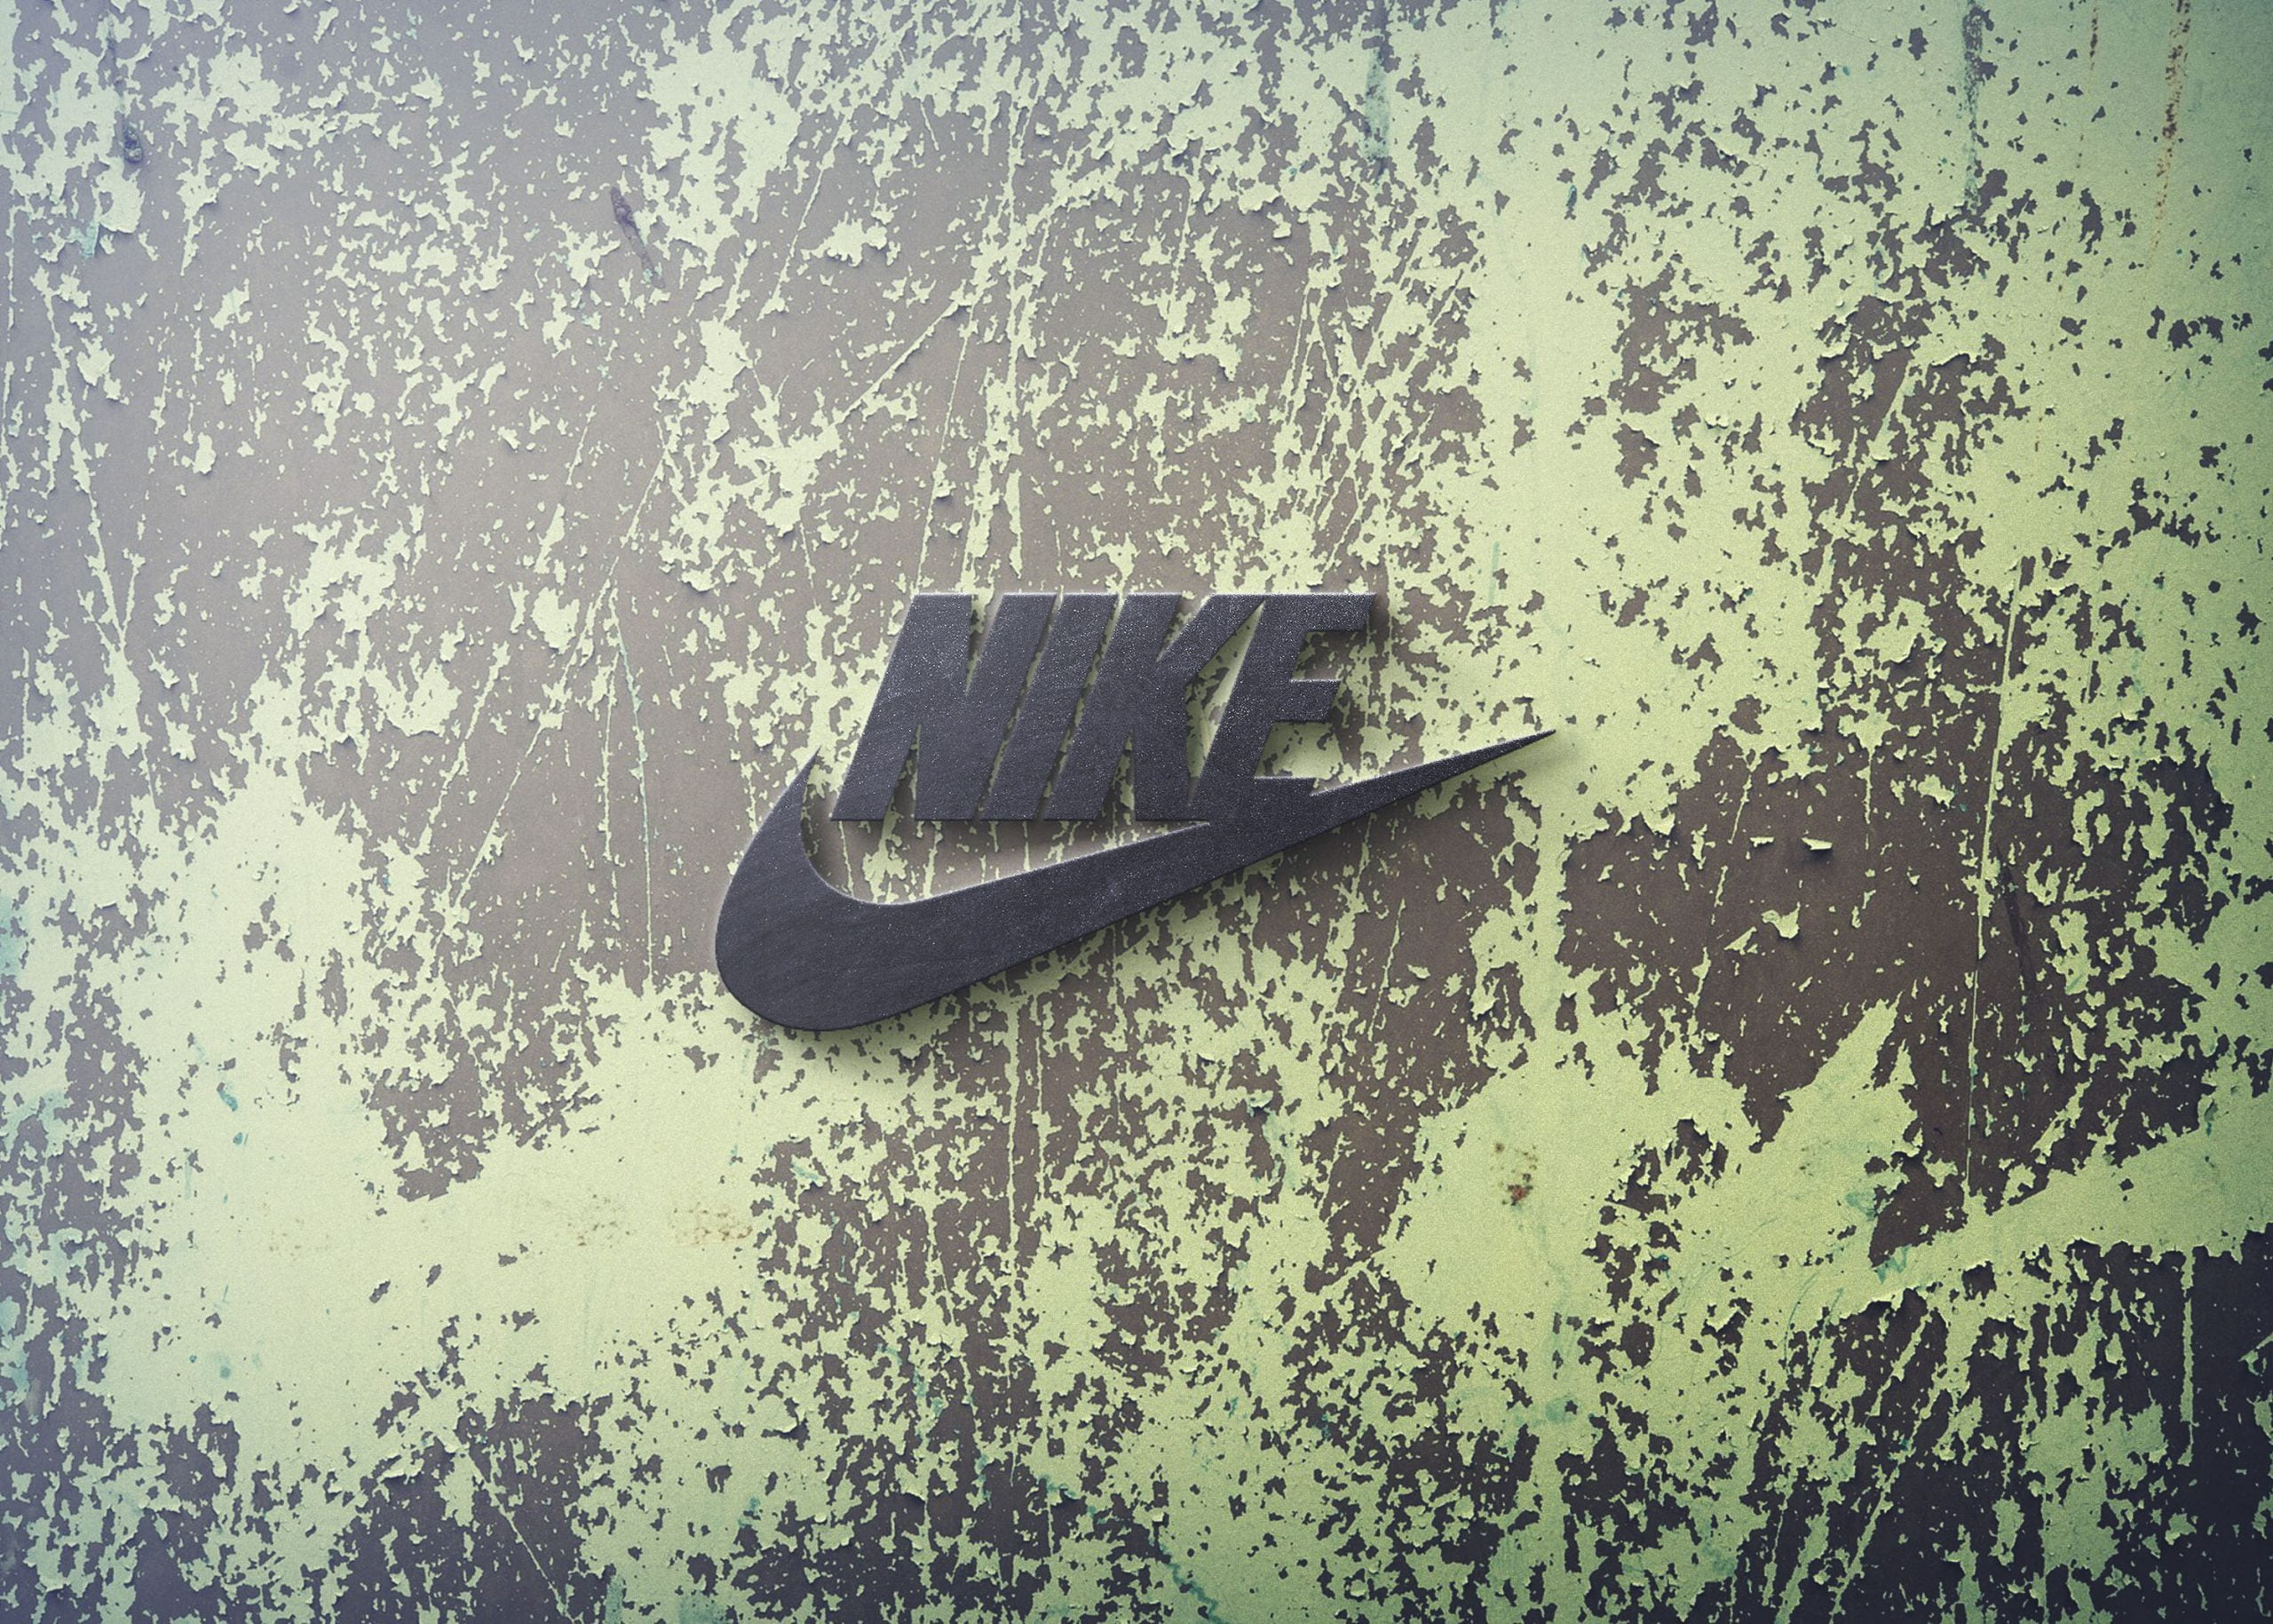 Nike 3d wall logo mockup free psd